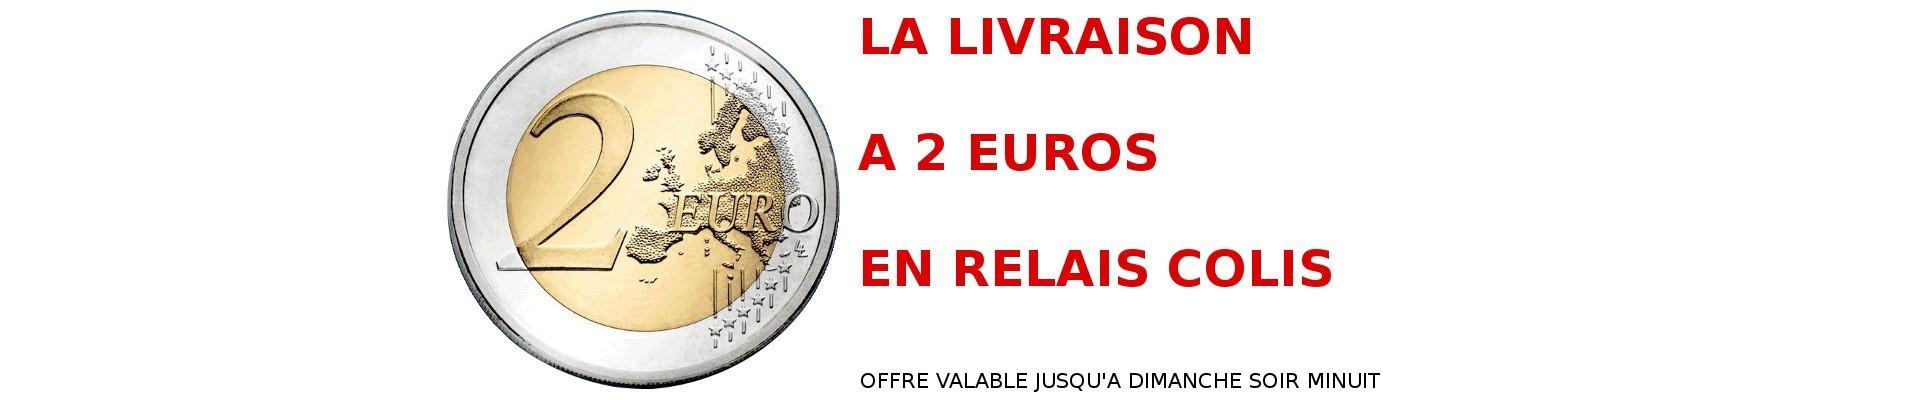 Livraison 2 euros relais colis pickup